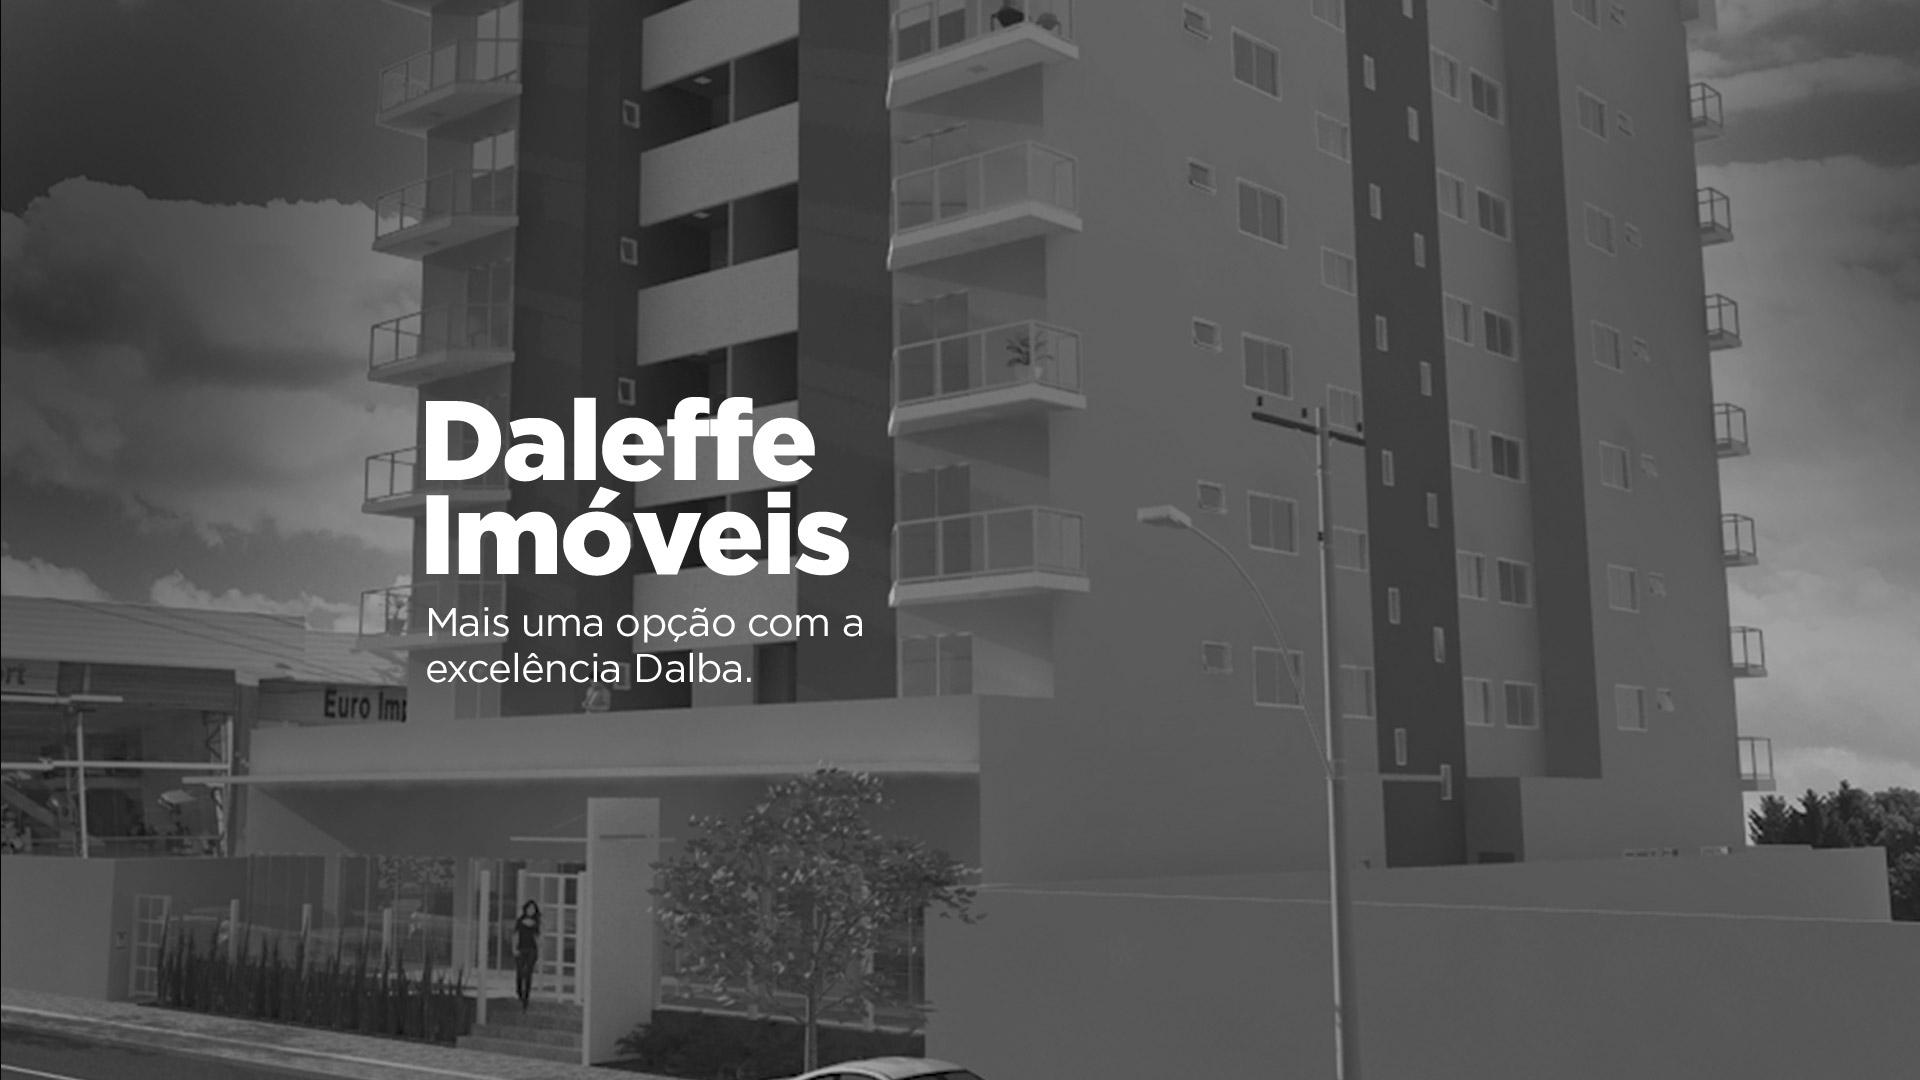 Daleffe Imóveis